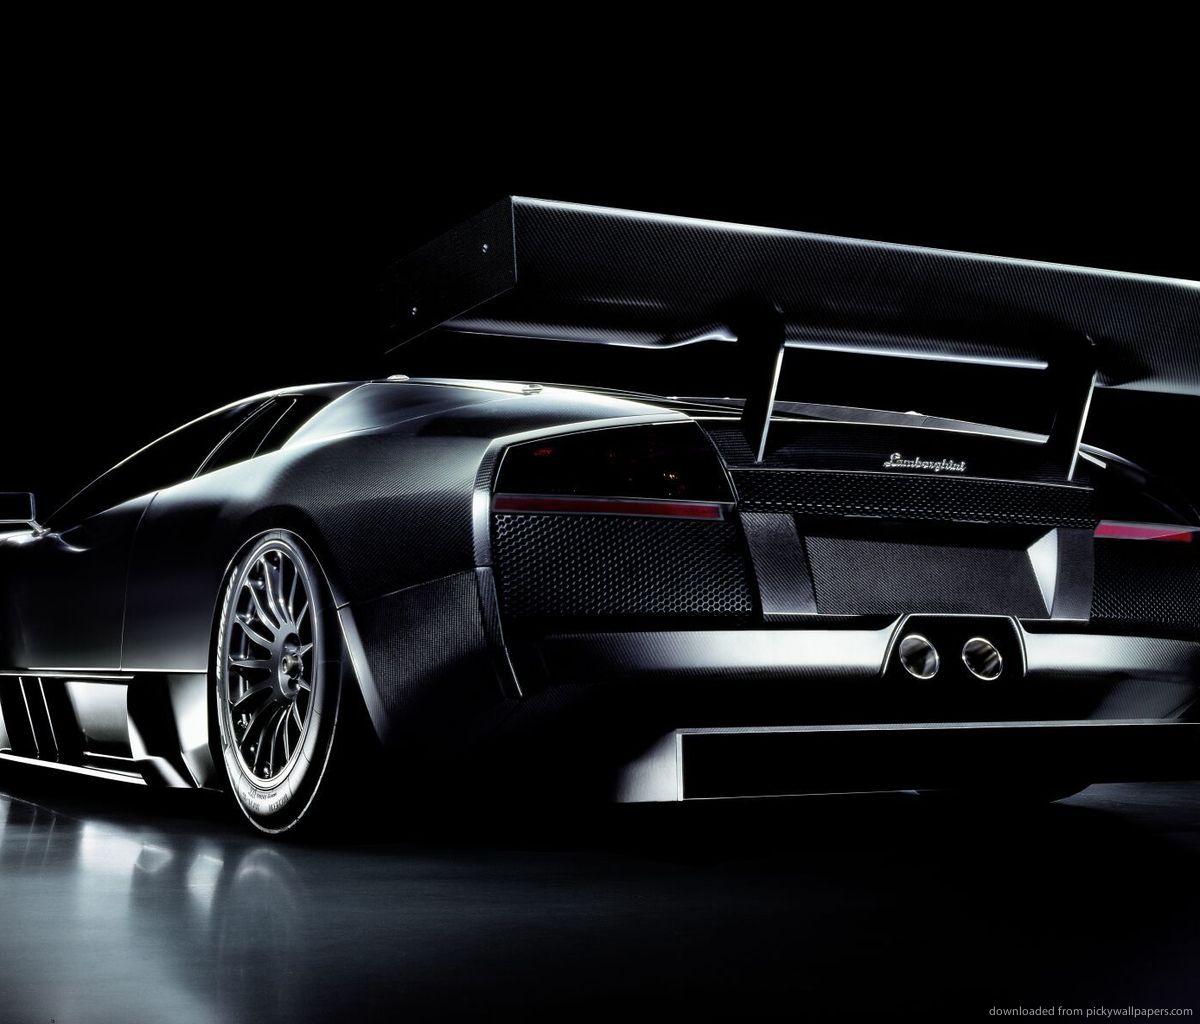 Lovely Black Lamborghini Murcielago Wallpaper